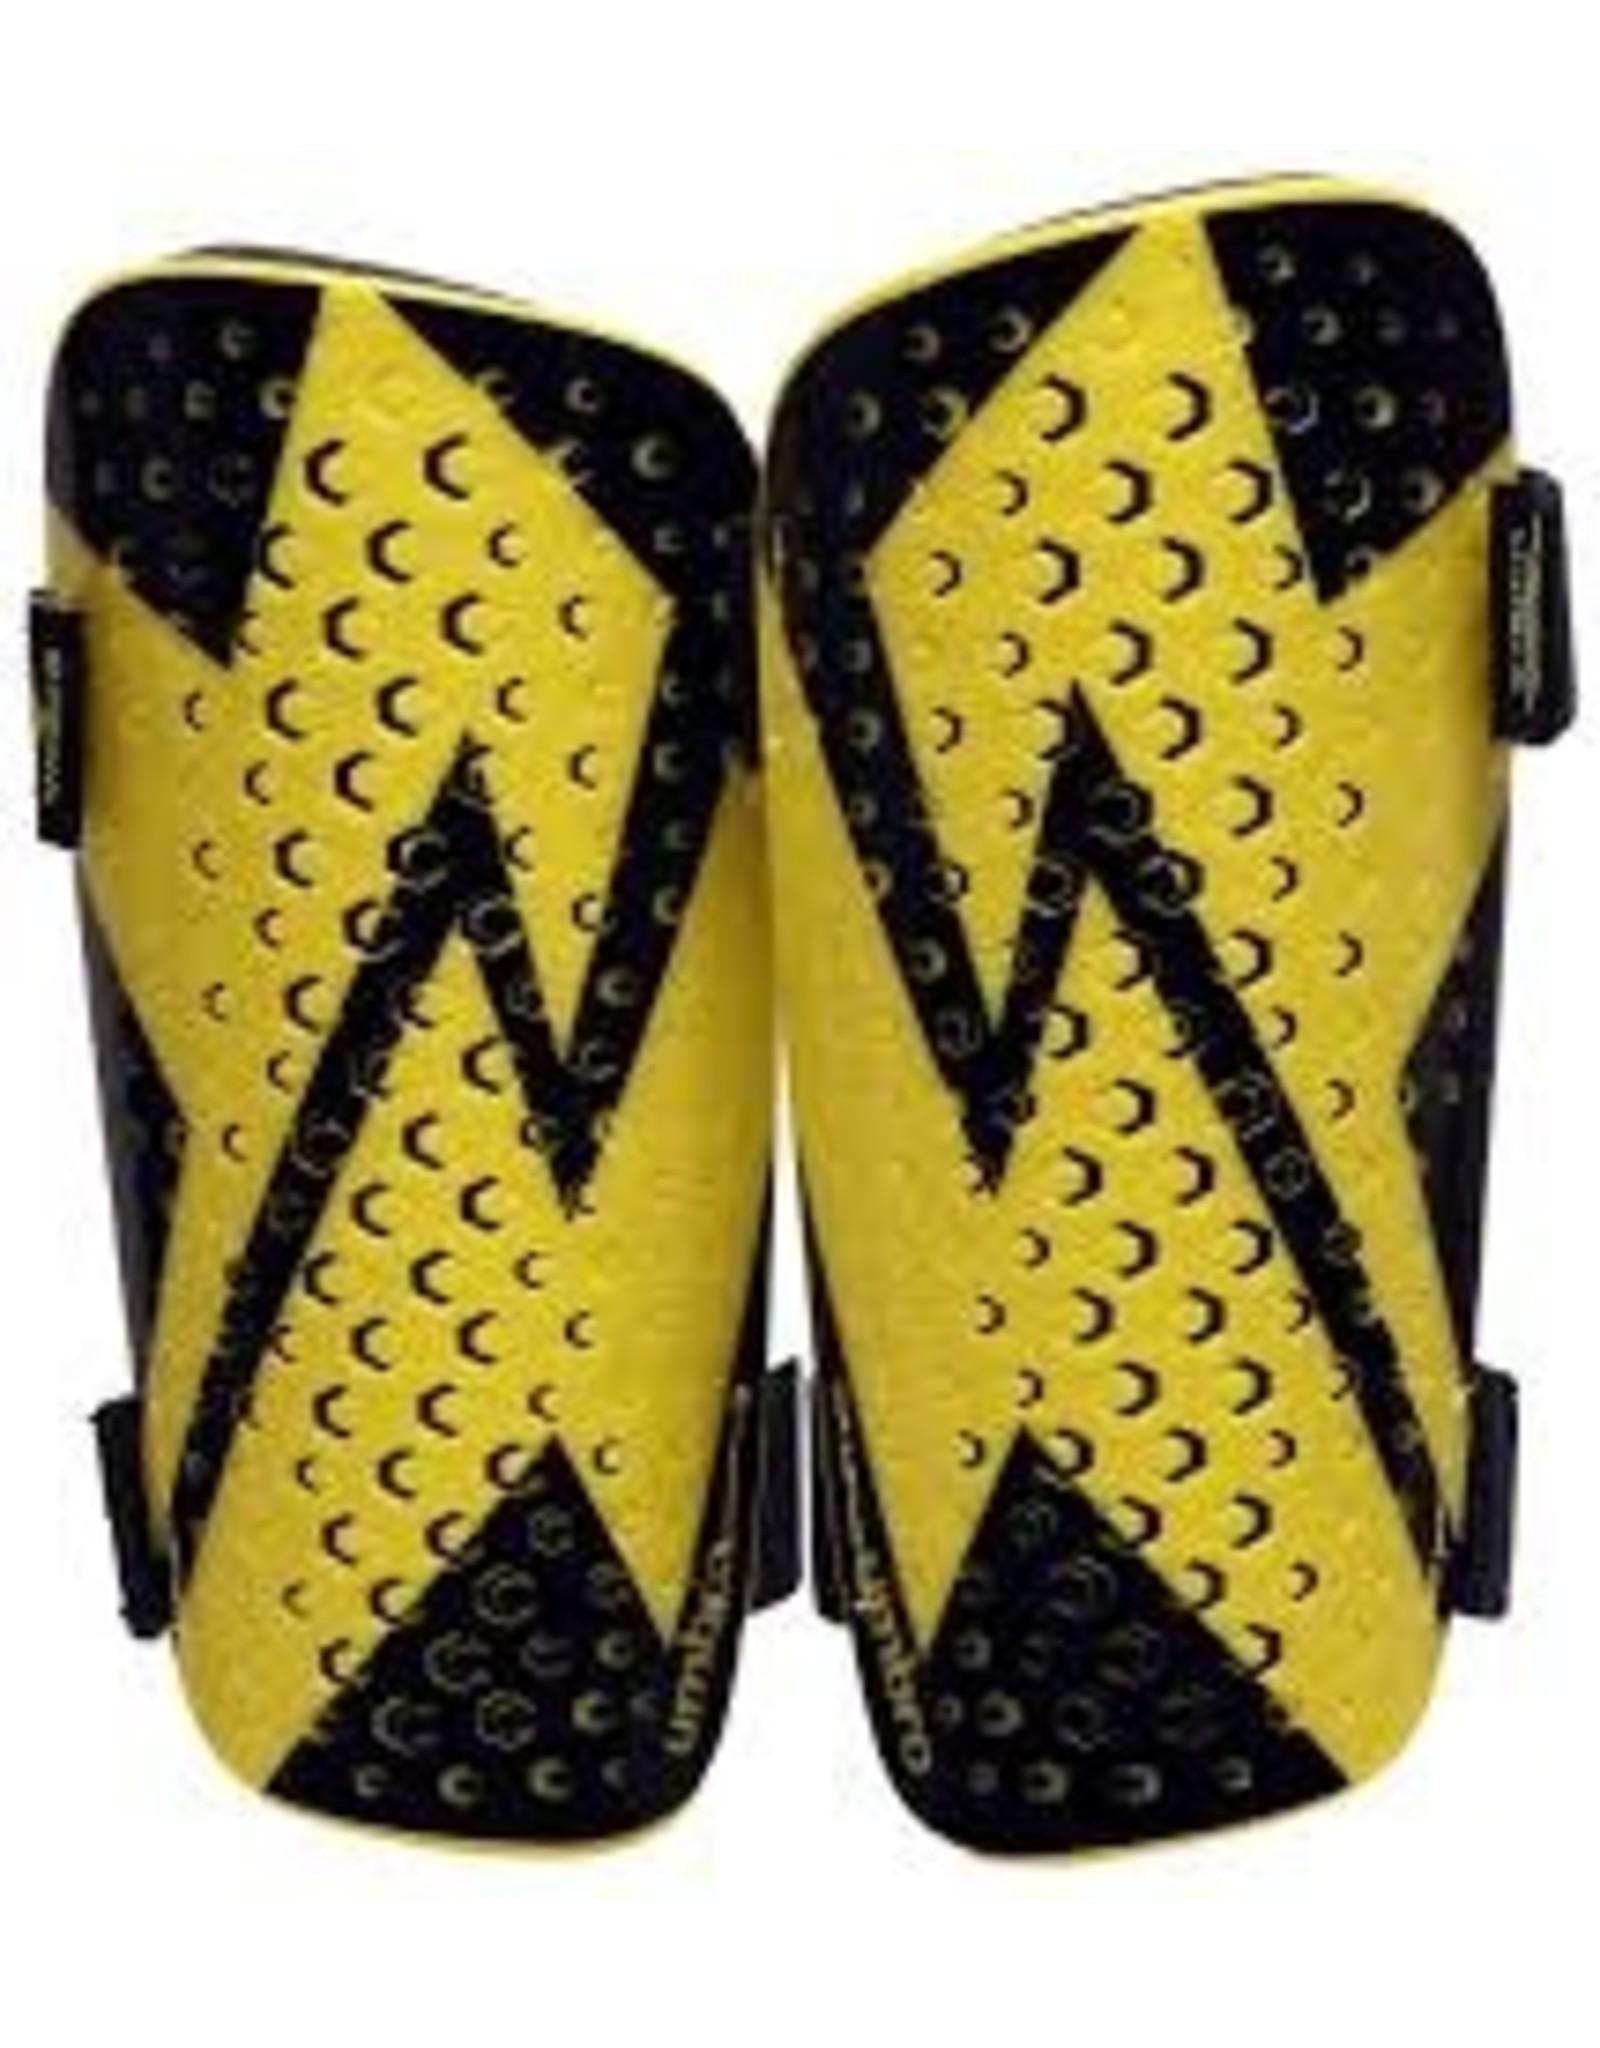 Umbro Umbro Neo Vento Slip Shin Guard (Golden Kiwi/Black)